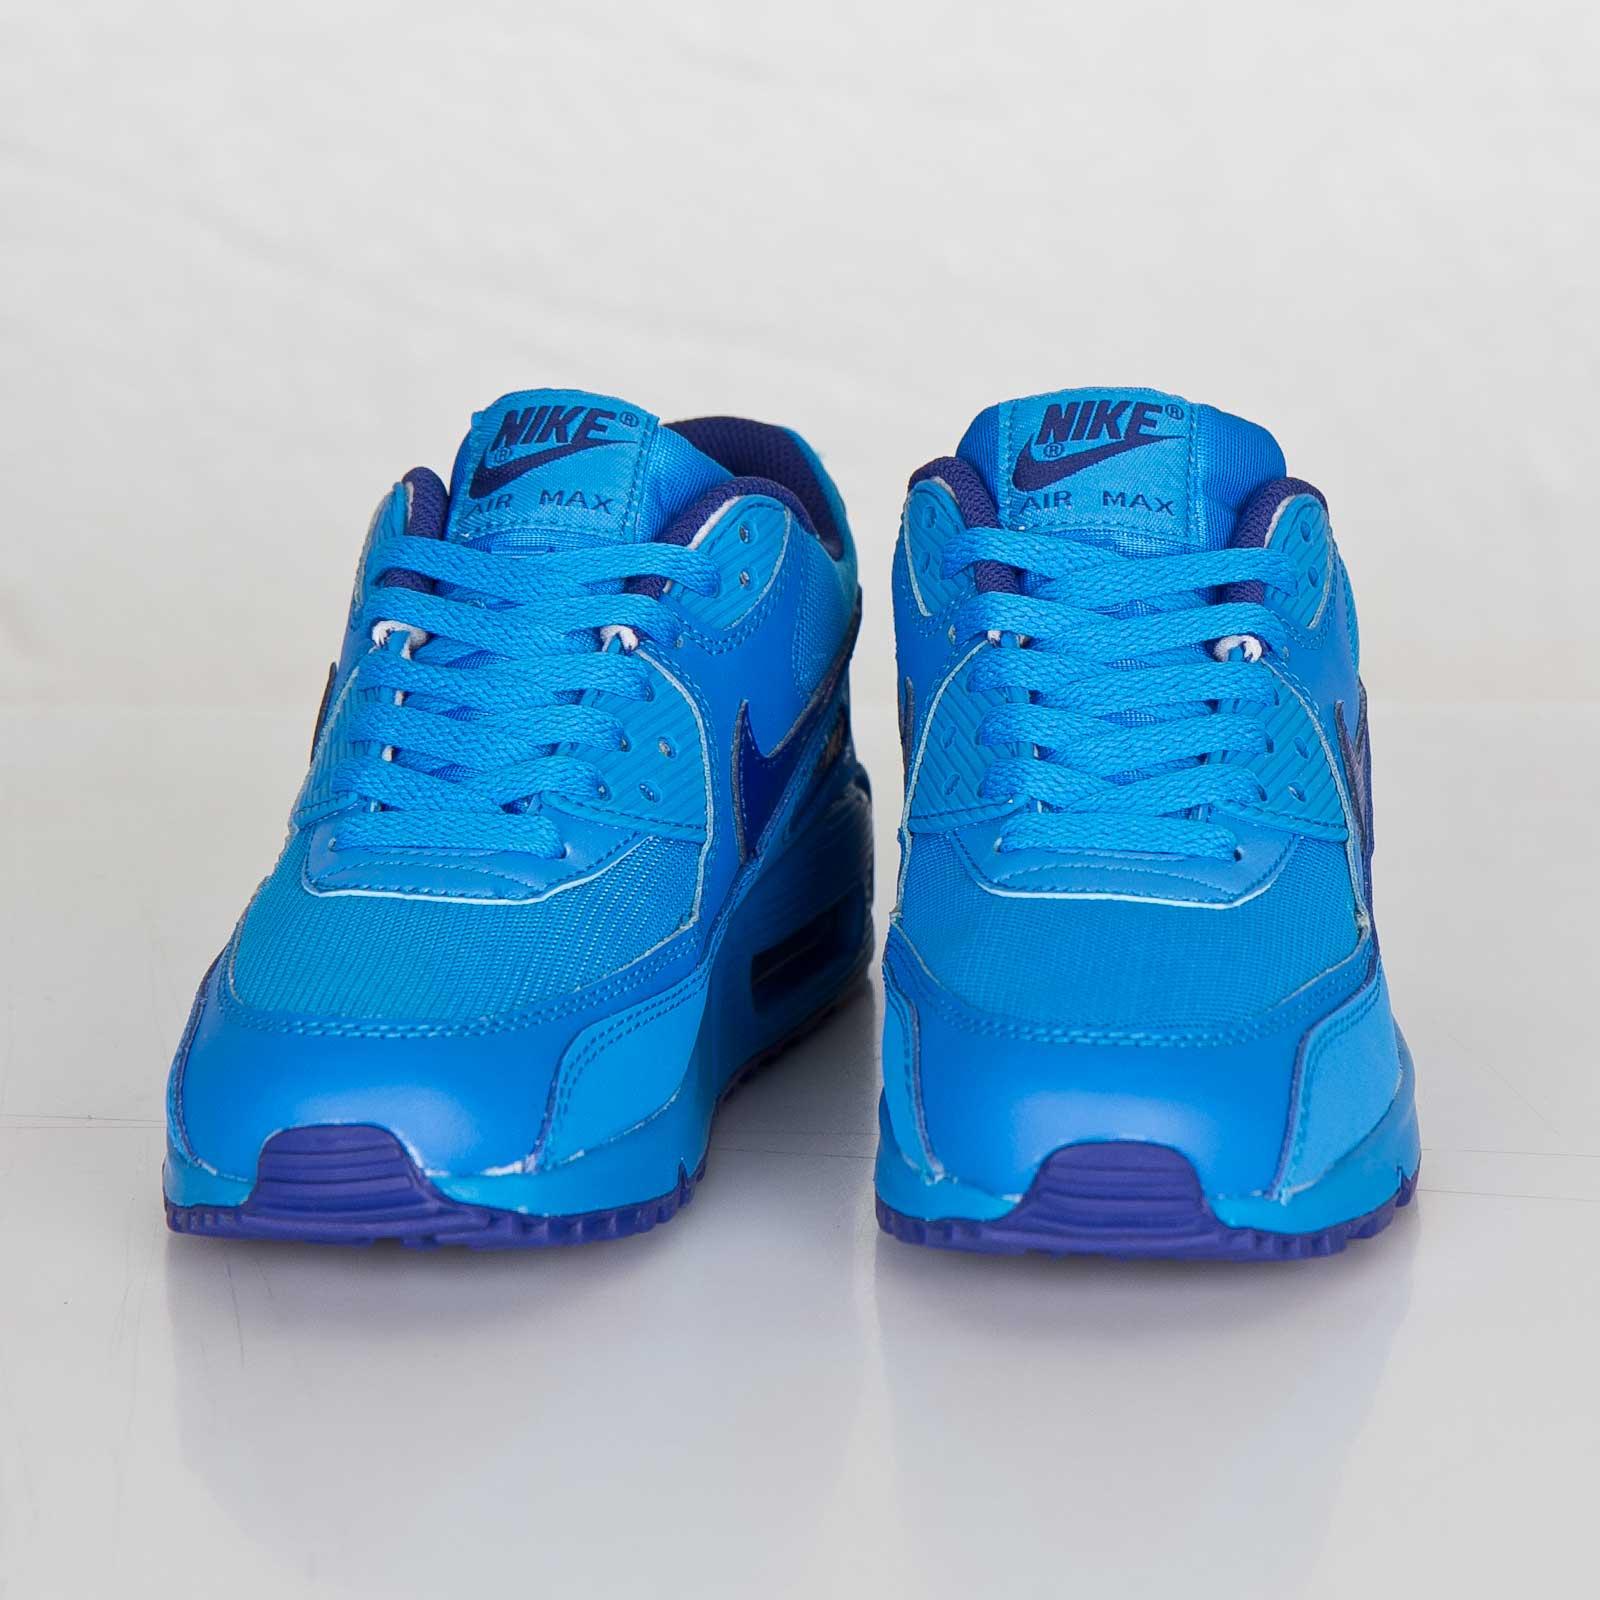 6a6ef4bd4aa Nike Air Max 90 (GS) - 307793-408 - Sneakersnstuff